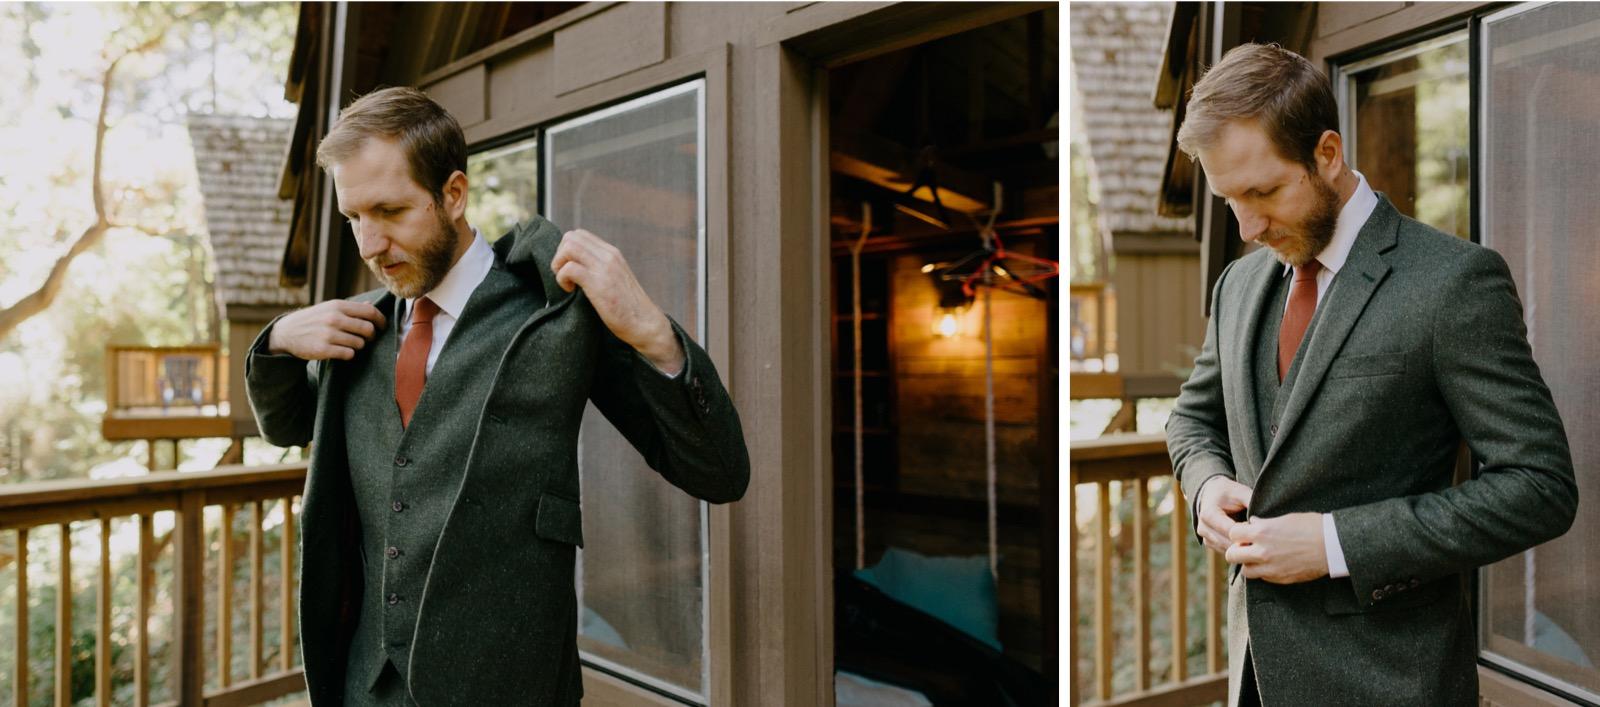 008_Emily & Jeff Wedding 0068_Emily & Jeff Wedding 0066_vest_groom_getting-ready_green